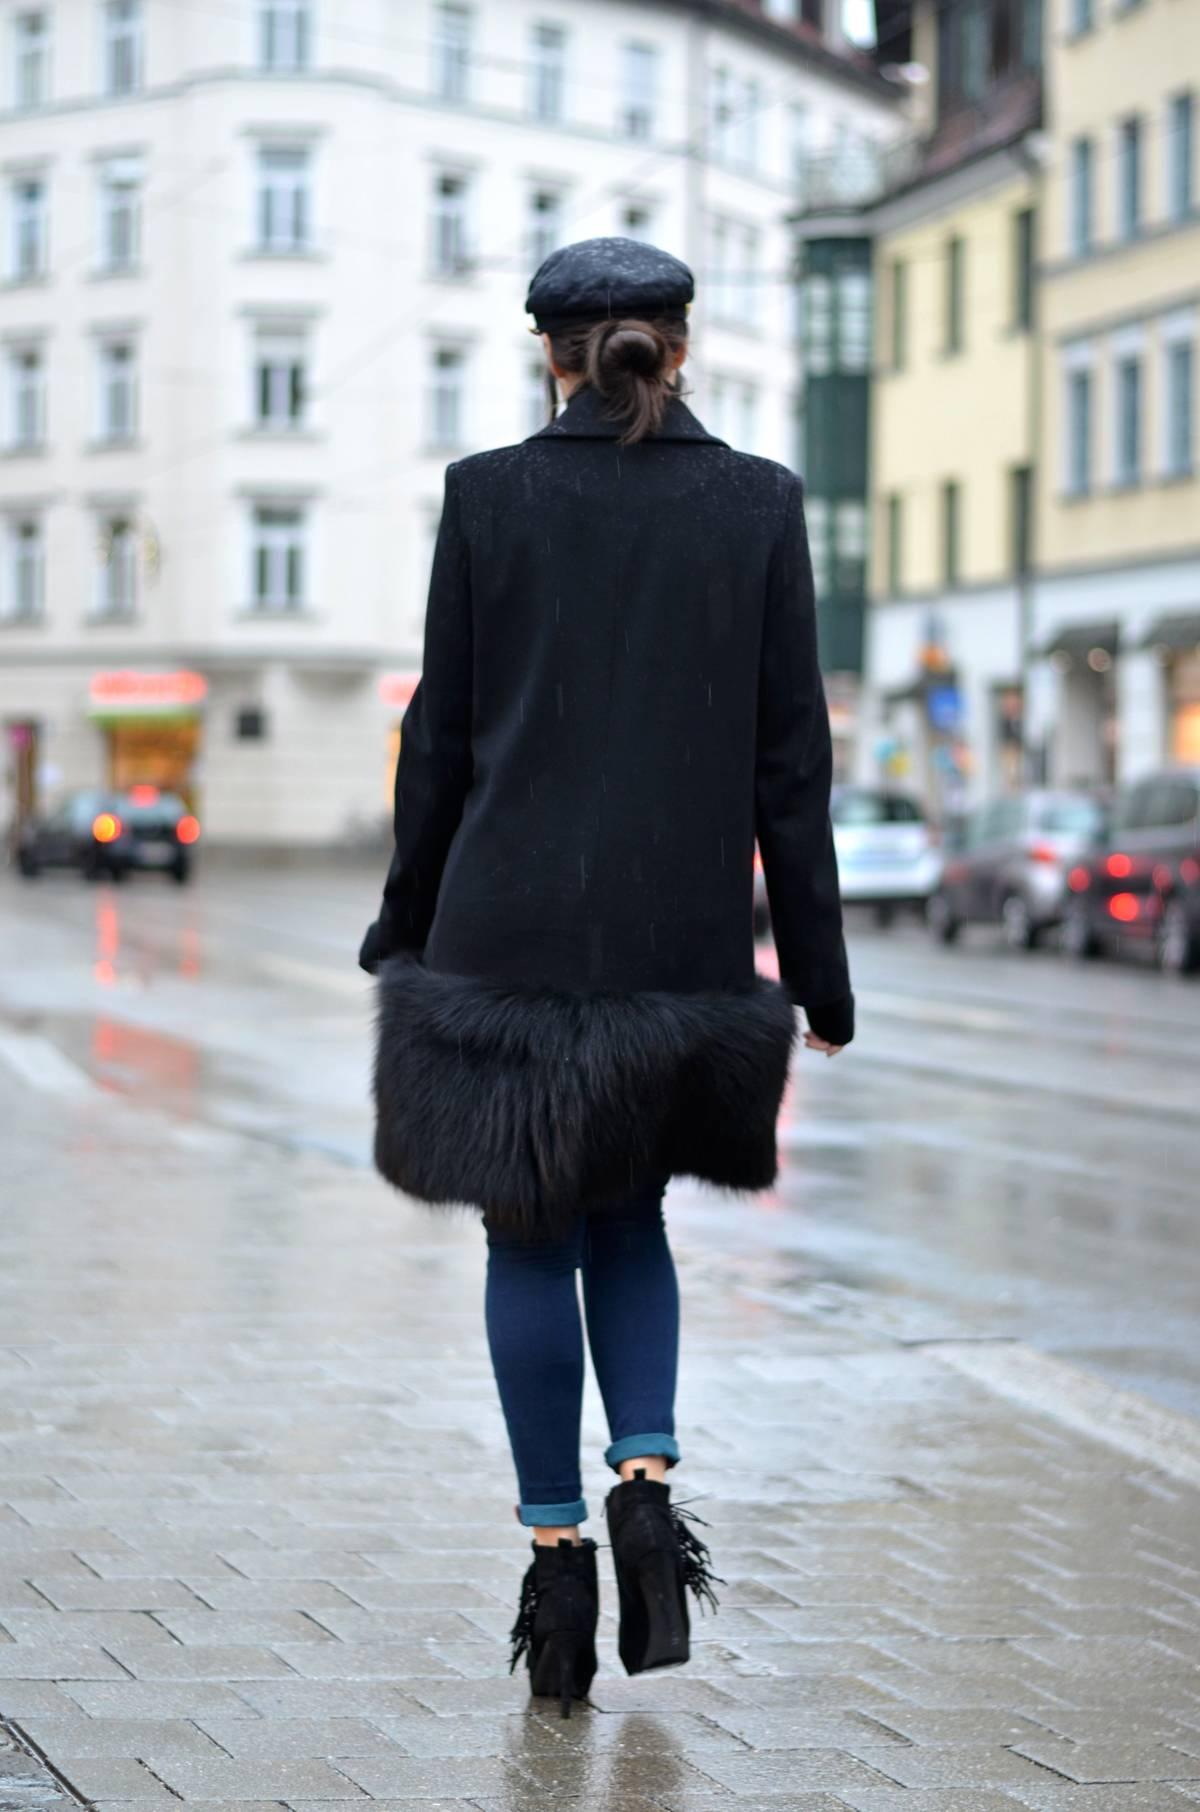 The Fishermans Cap-Schirmmütze-OOTD-Look-Outfit-Streetsyle-Munich-München-Antoinette-Pelzmantel-Designer-Fashionblogger-German-Fashionblog-Lookbook-Winter-Fringe Booties-Kennel und Schmenger-TheLoudCouture